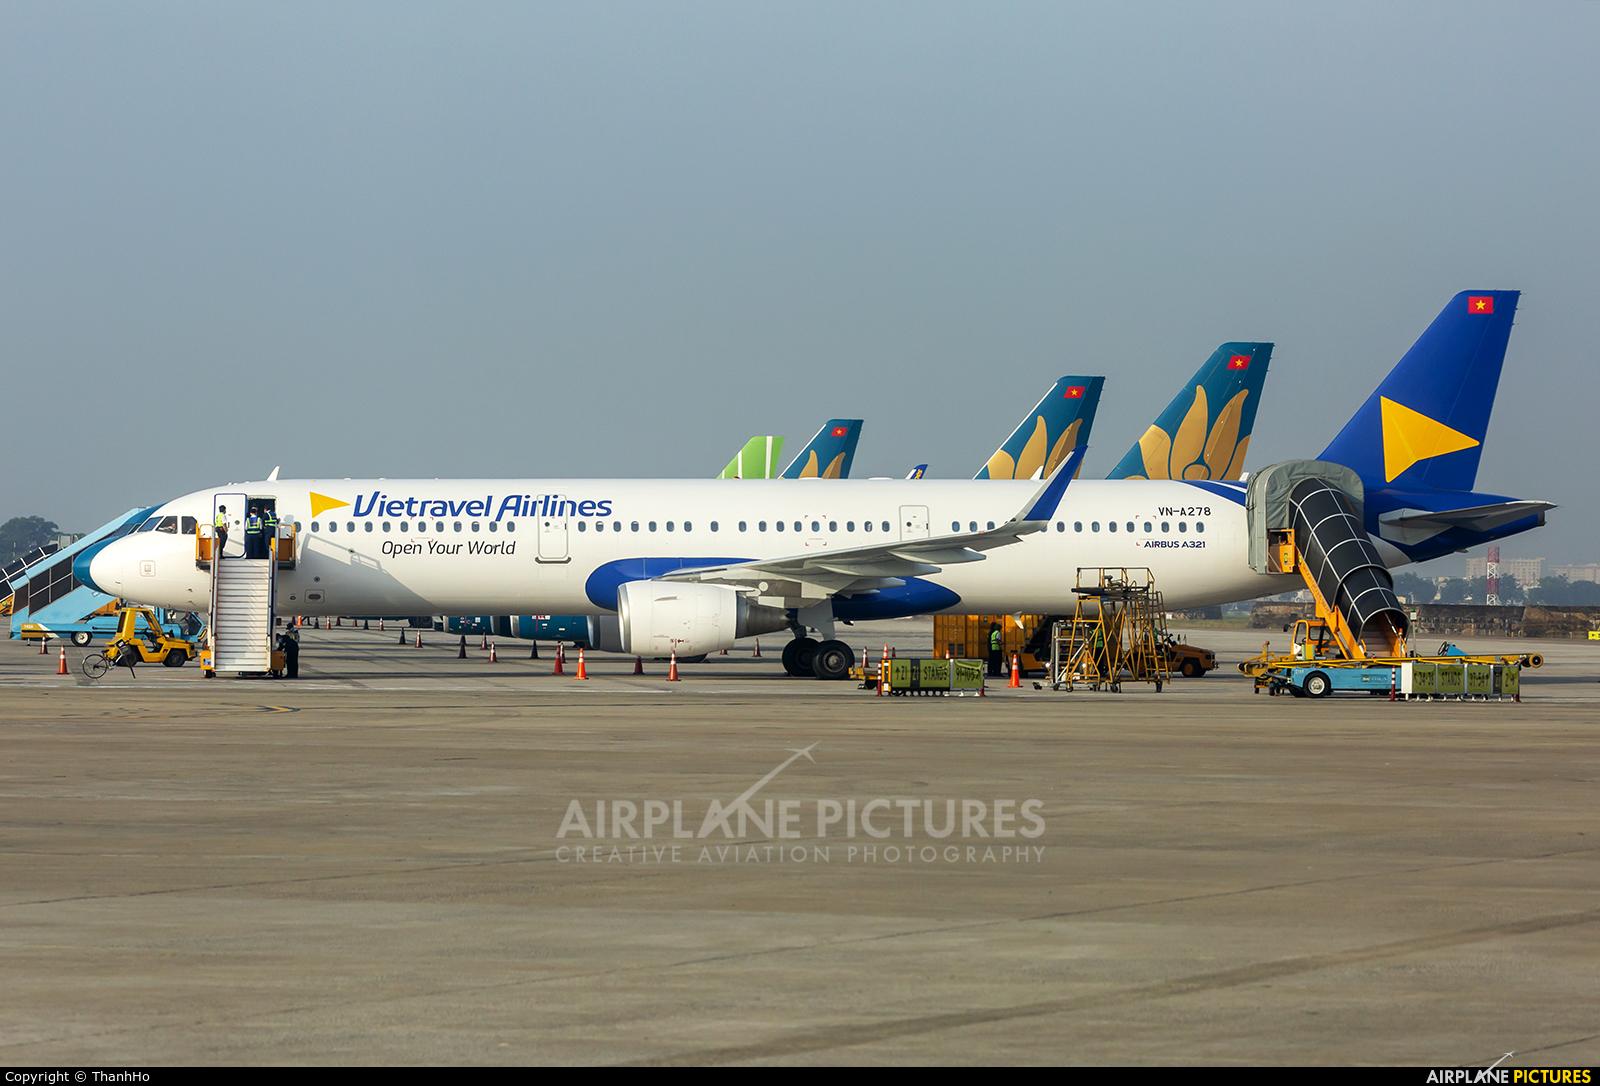 Vietravel Airlines VN-A278 aircraft at Ho Chi Minh City - Tan Son Nhat Intl